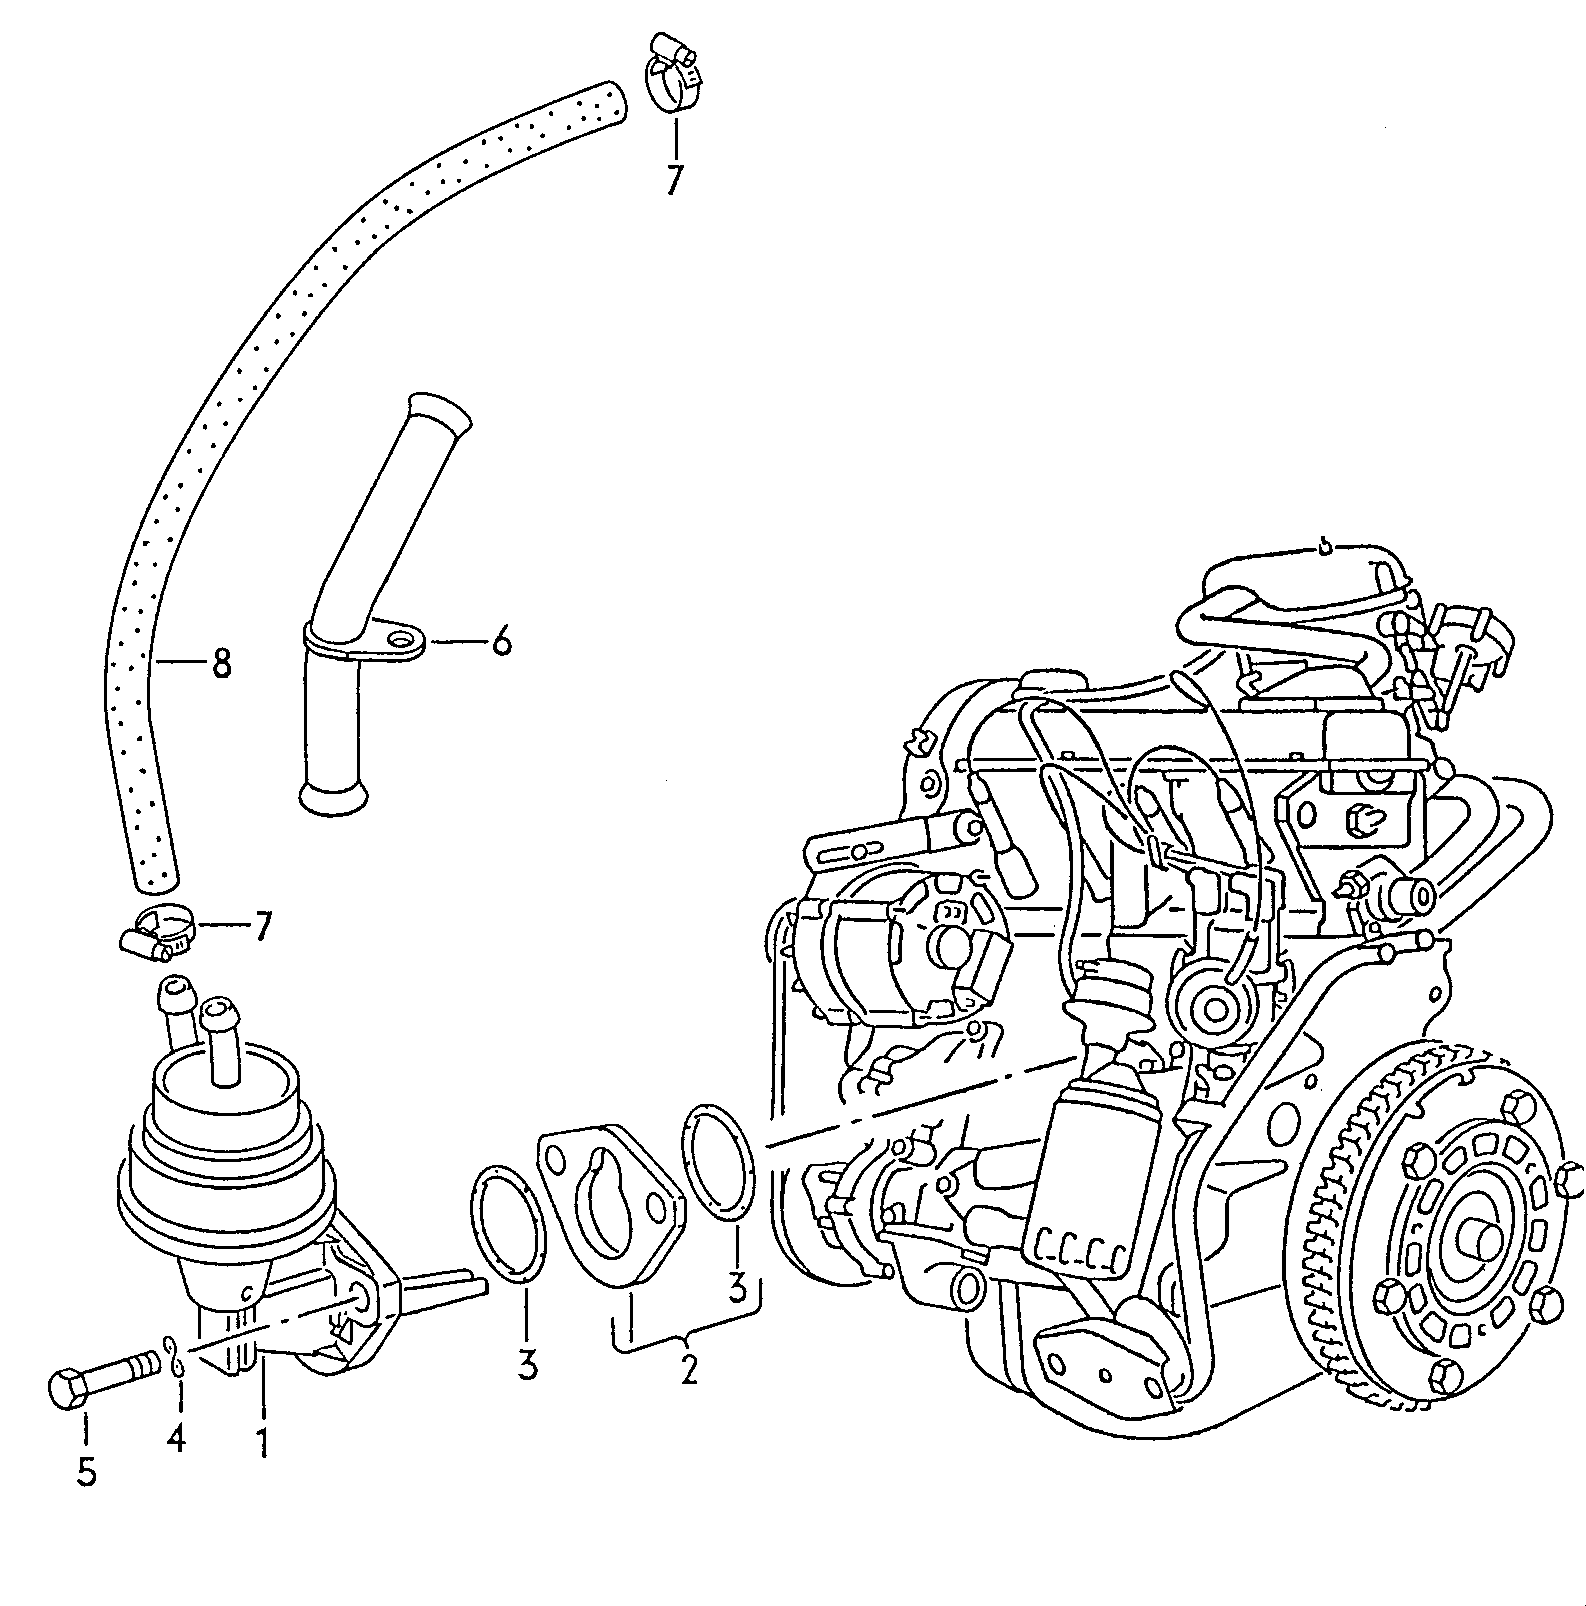 Vw Transporter Europe 1991 Engine 12710 T5 Wiring Diagram 2009 Parts